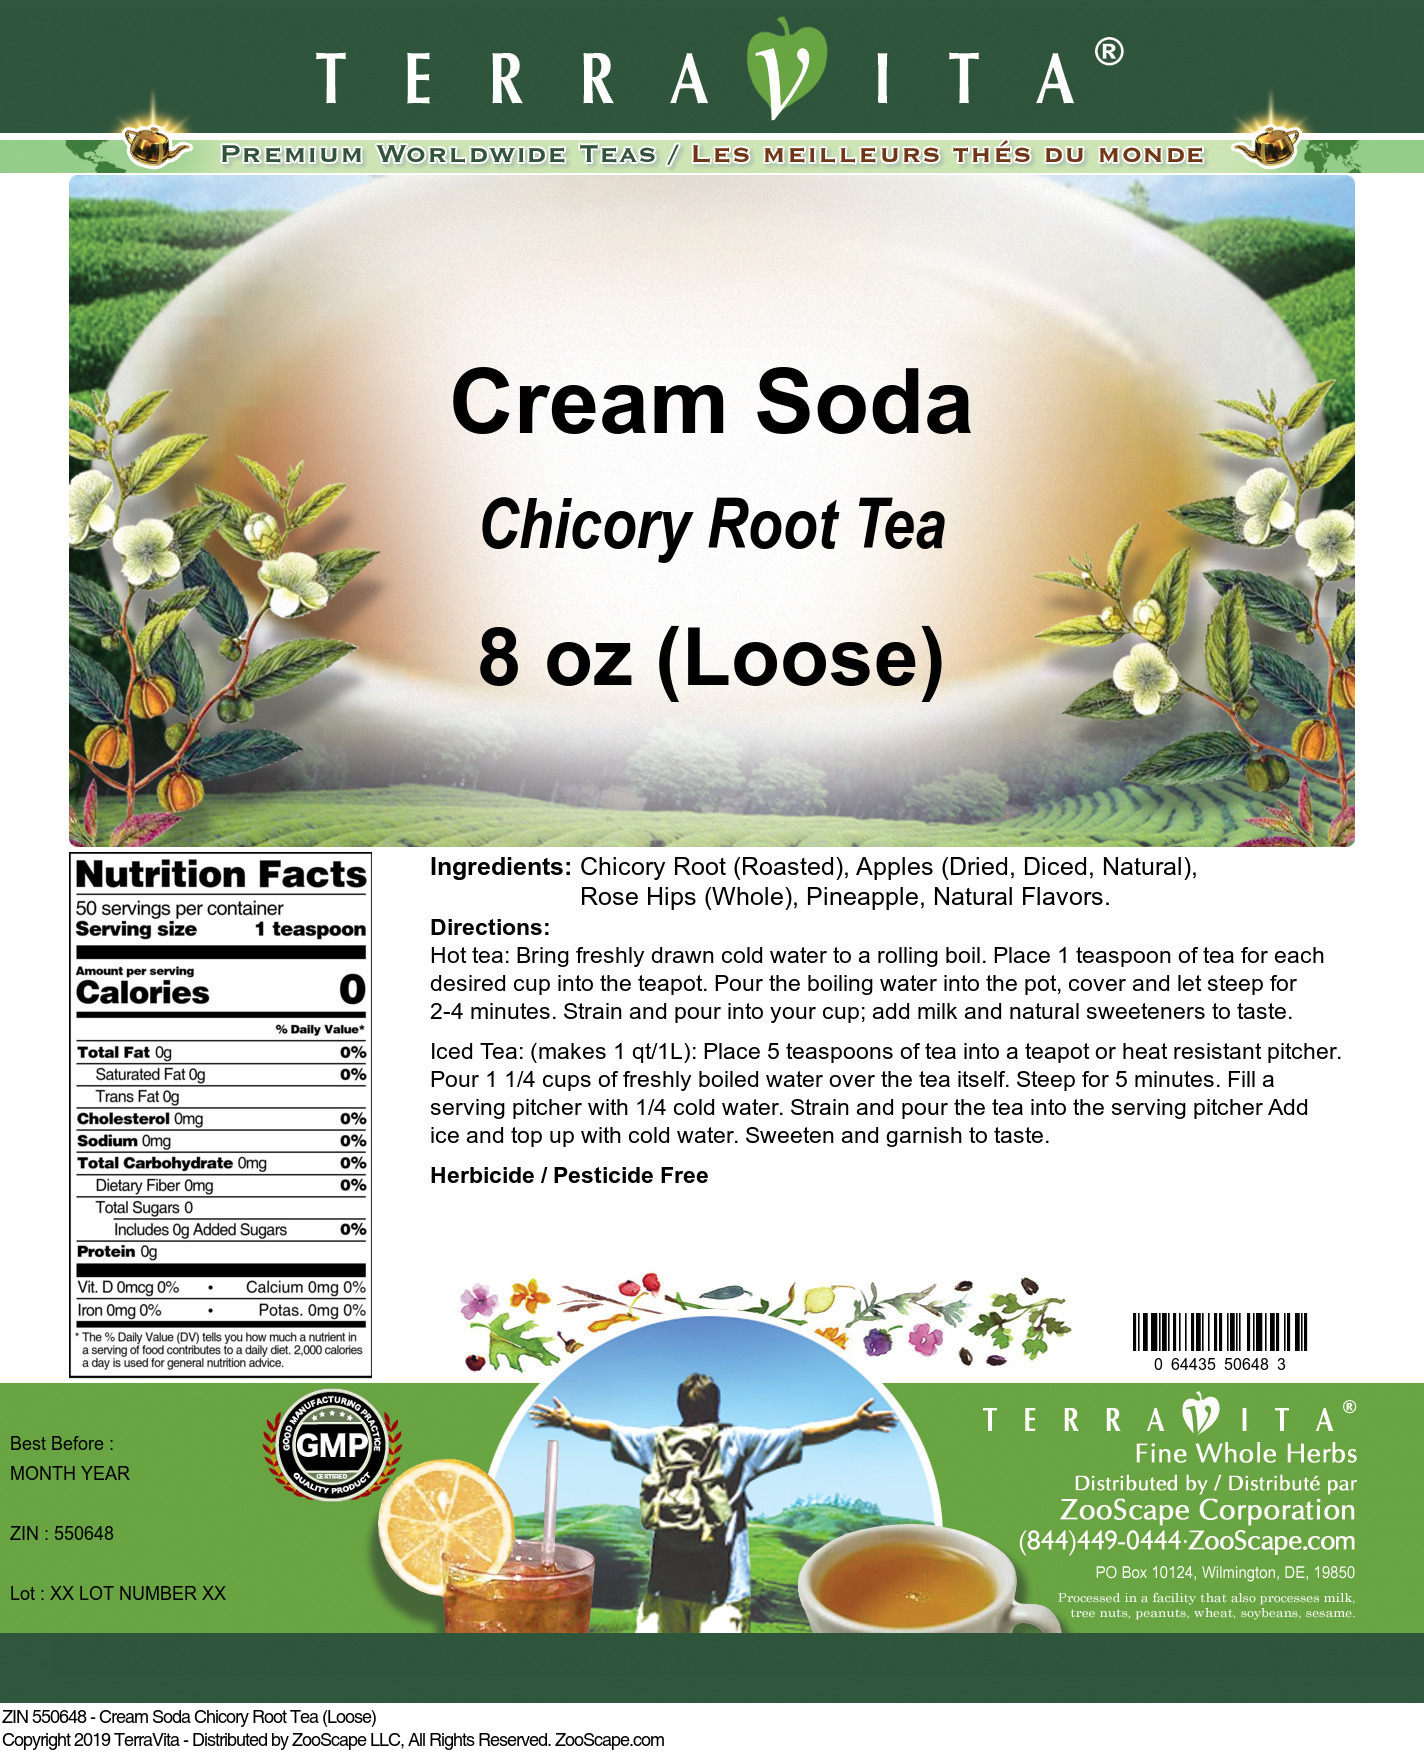 Cream Soda Chicory Root Tea (Loose)